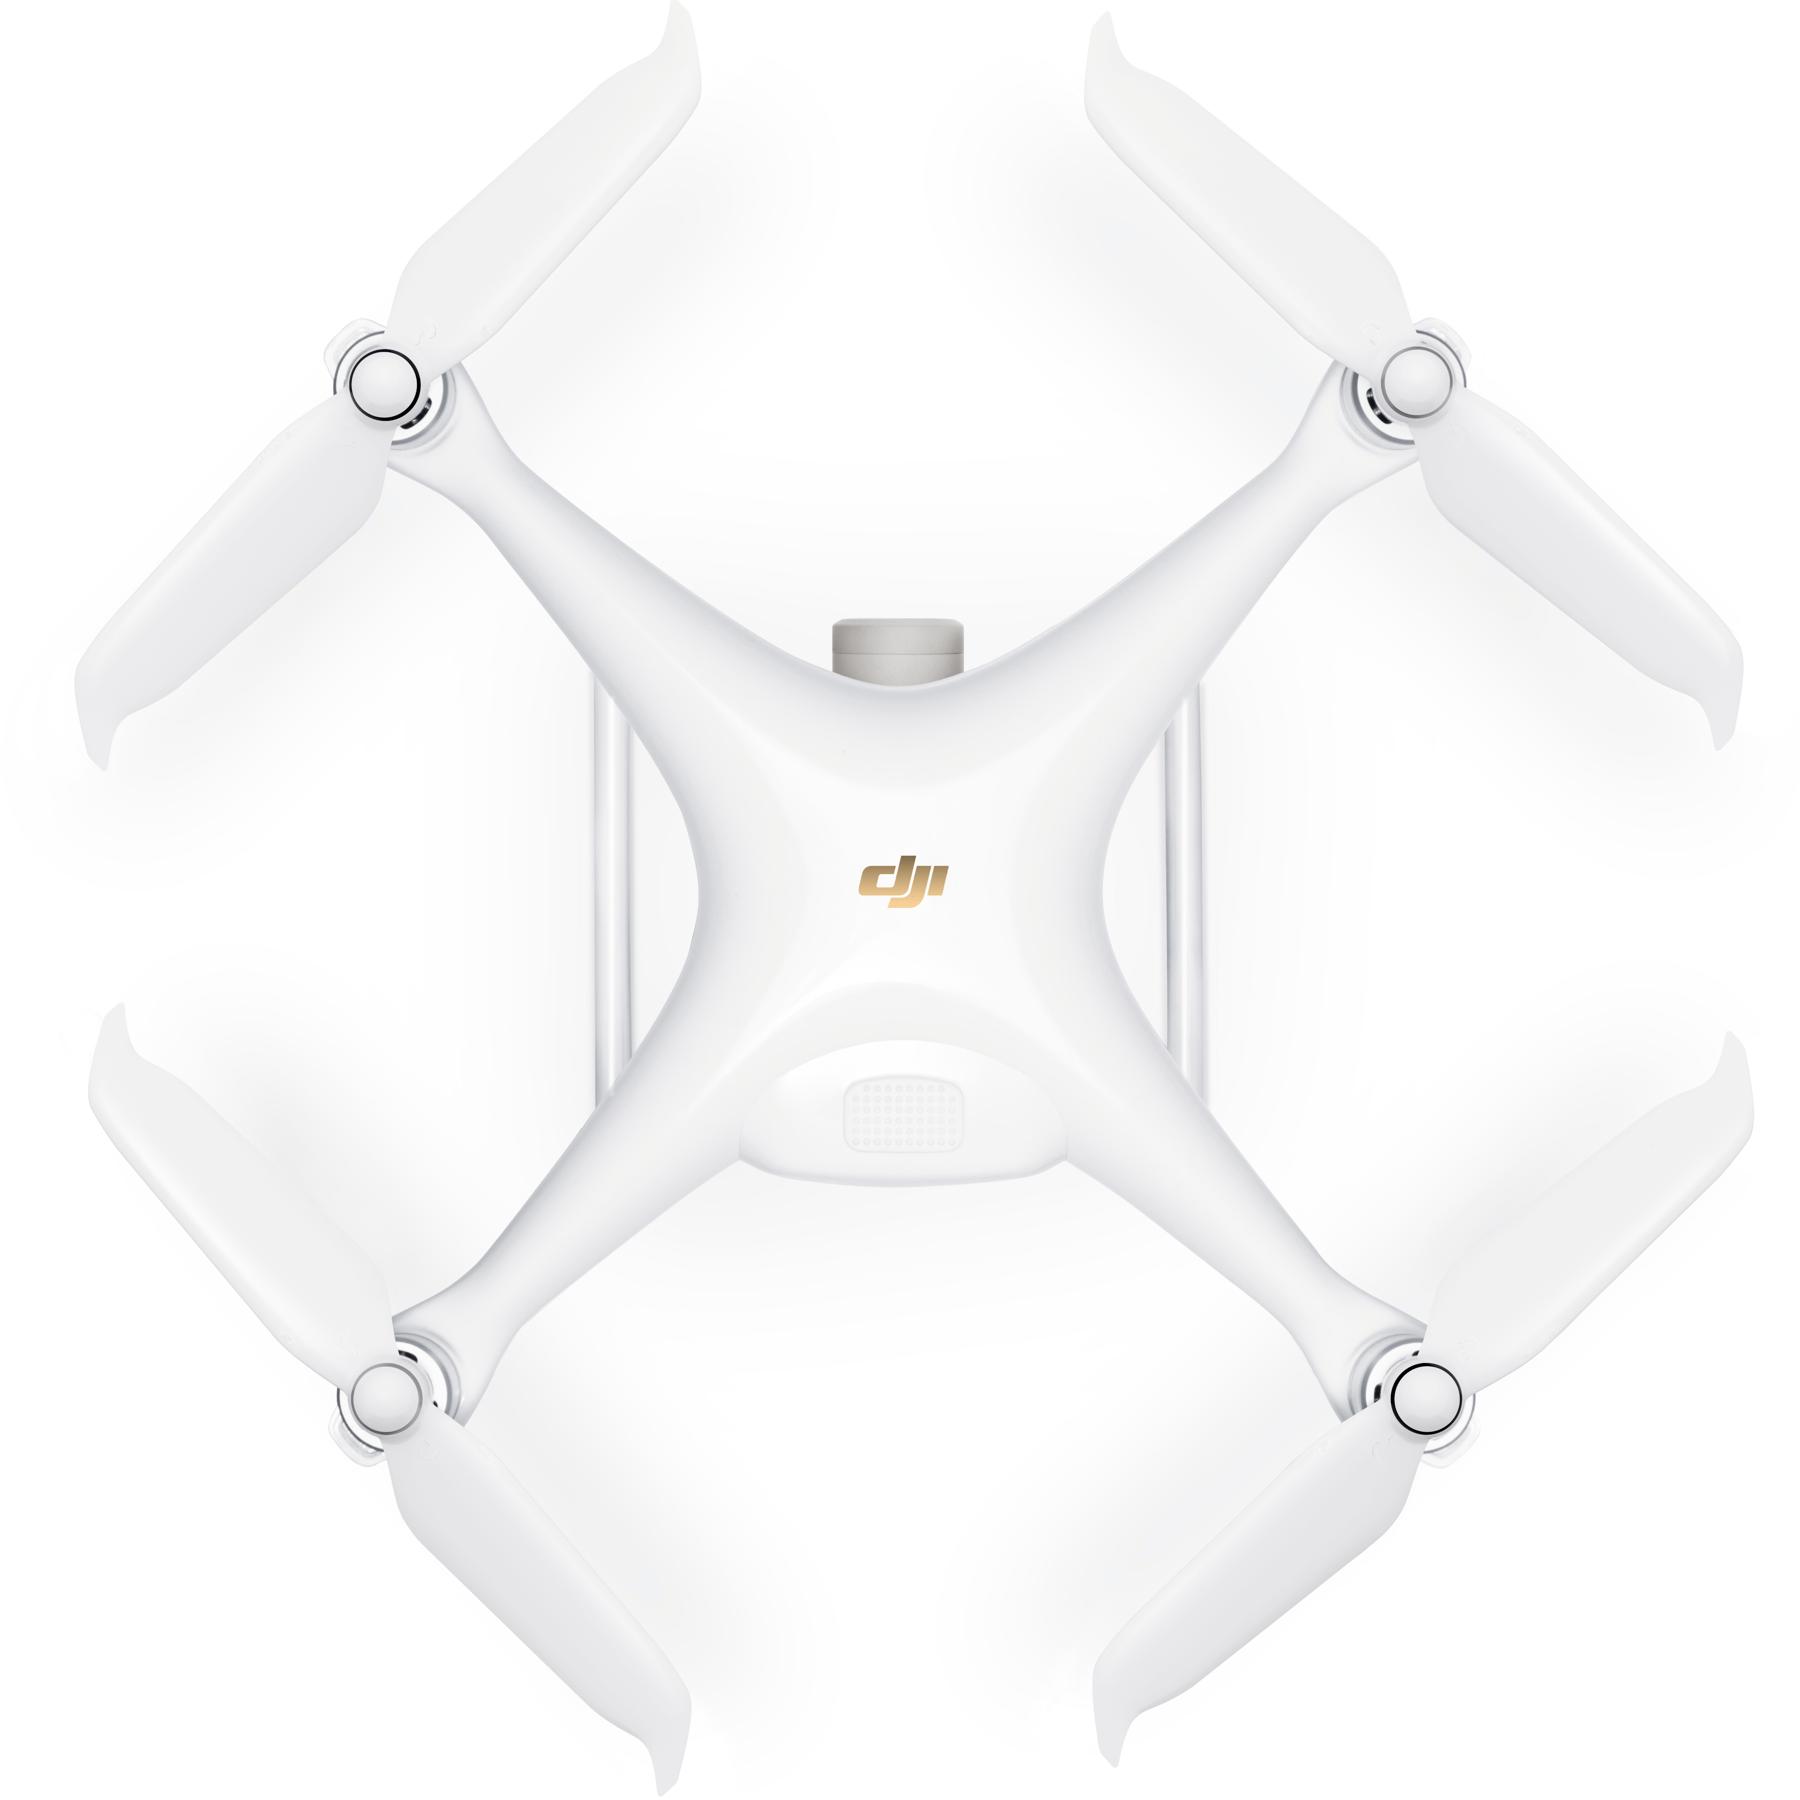 Dji Phantom 4 >> Dji Phantom 4 Pro V2 0 Professional Drone Dji